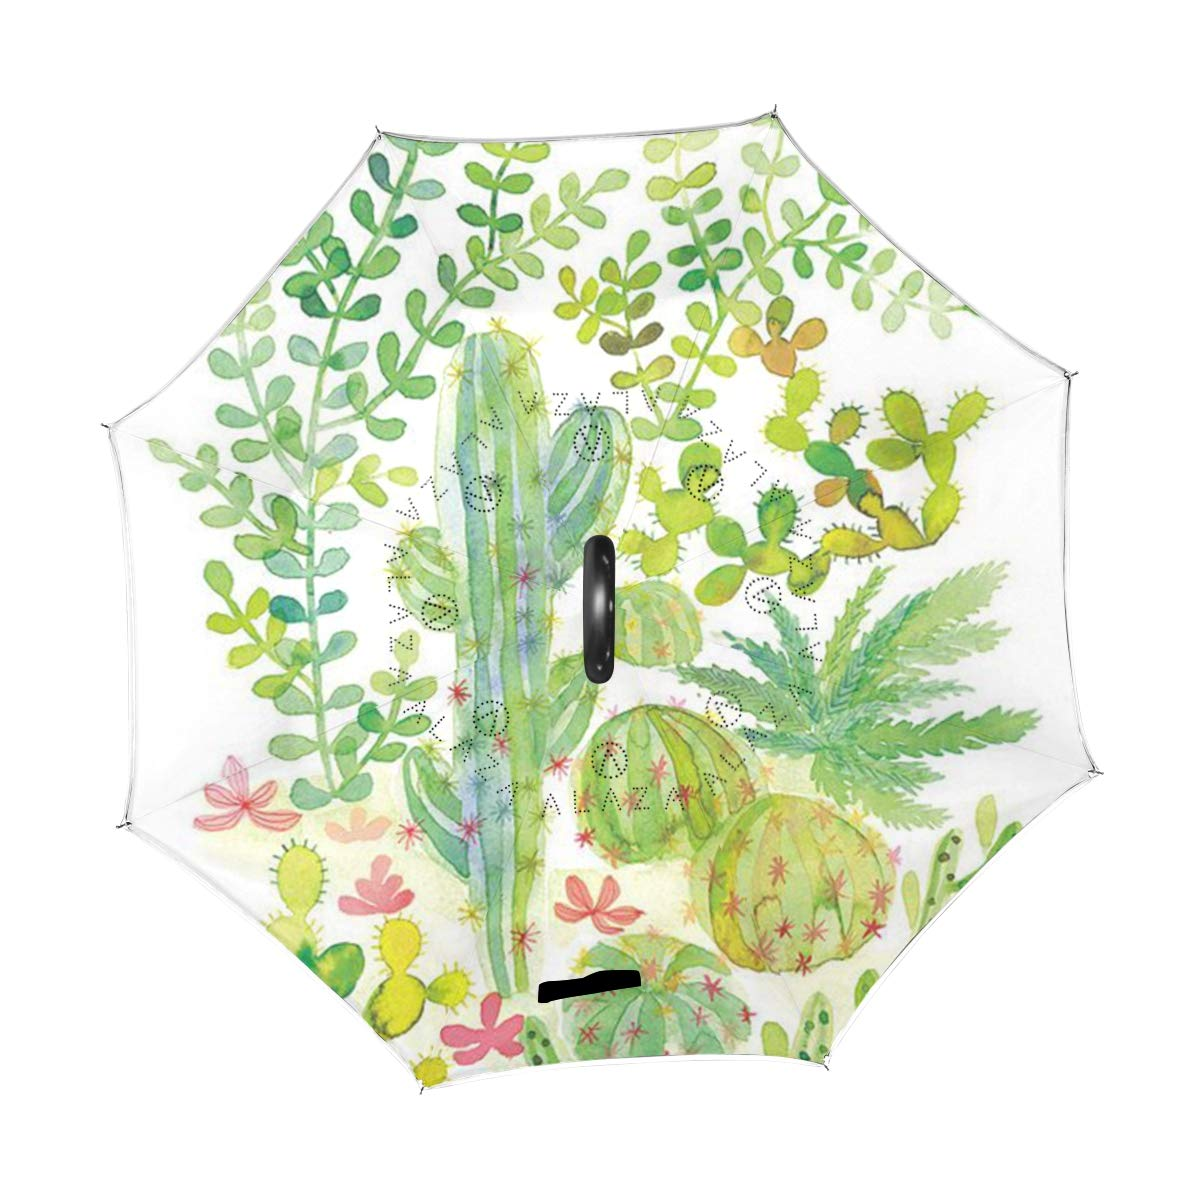 494580c59710 Amazon.com : Ladninag Reverse Umbrella Multicolor Green Cacti ...